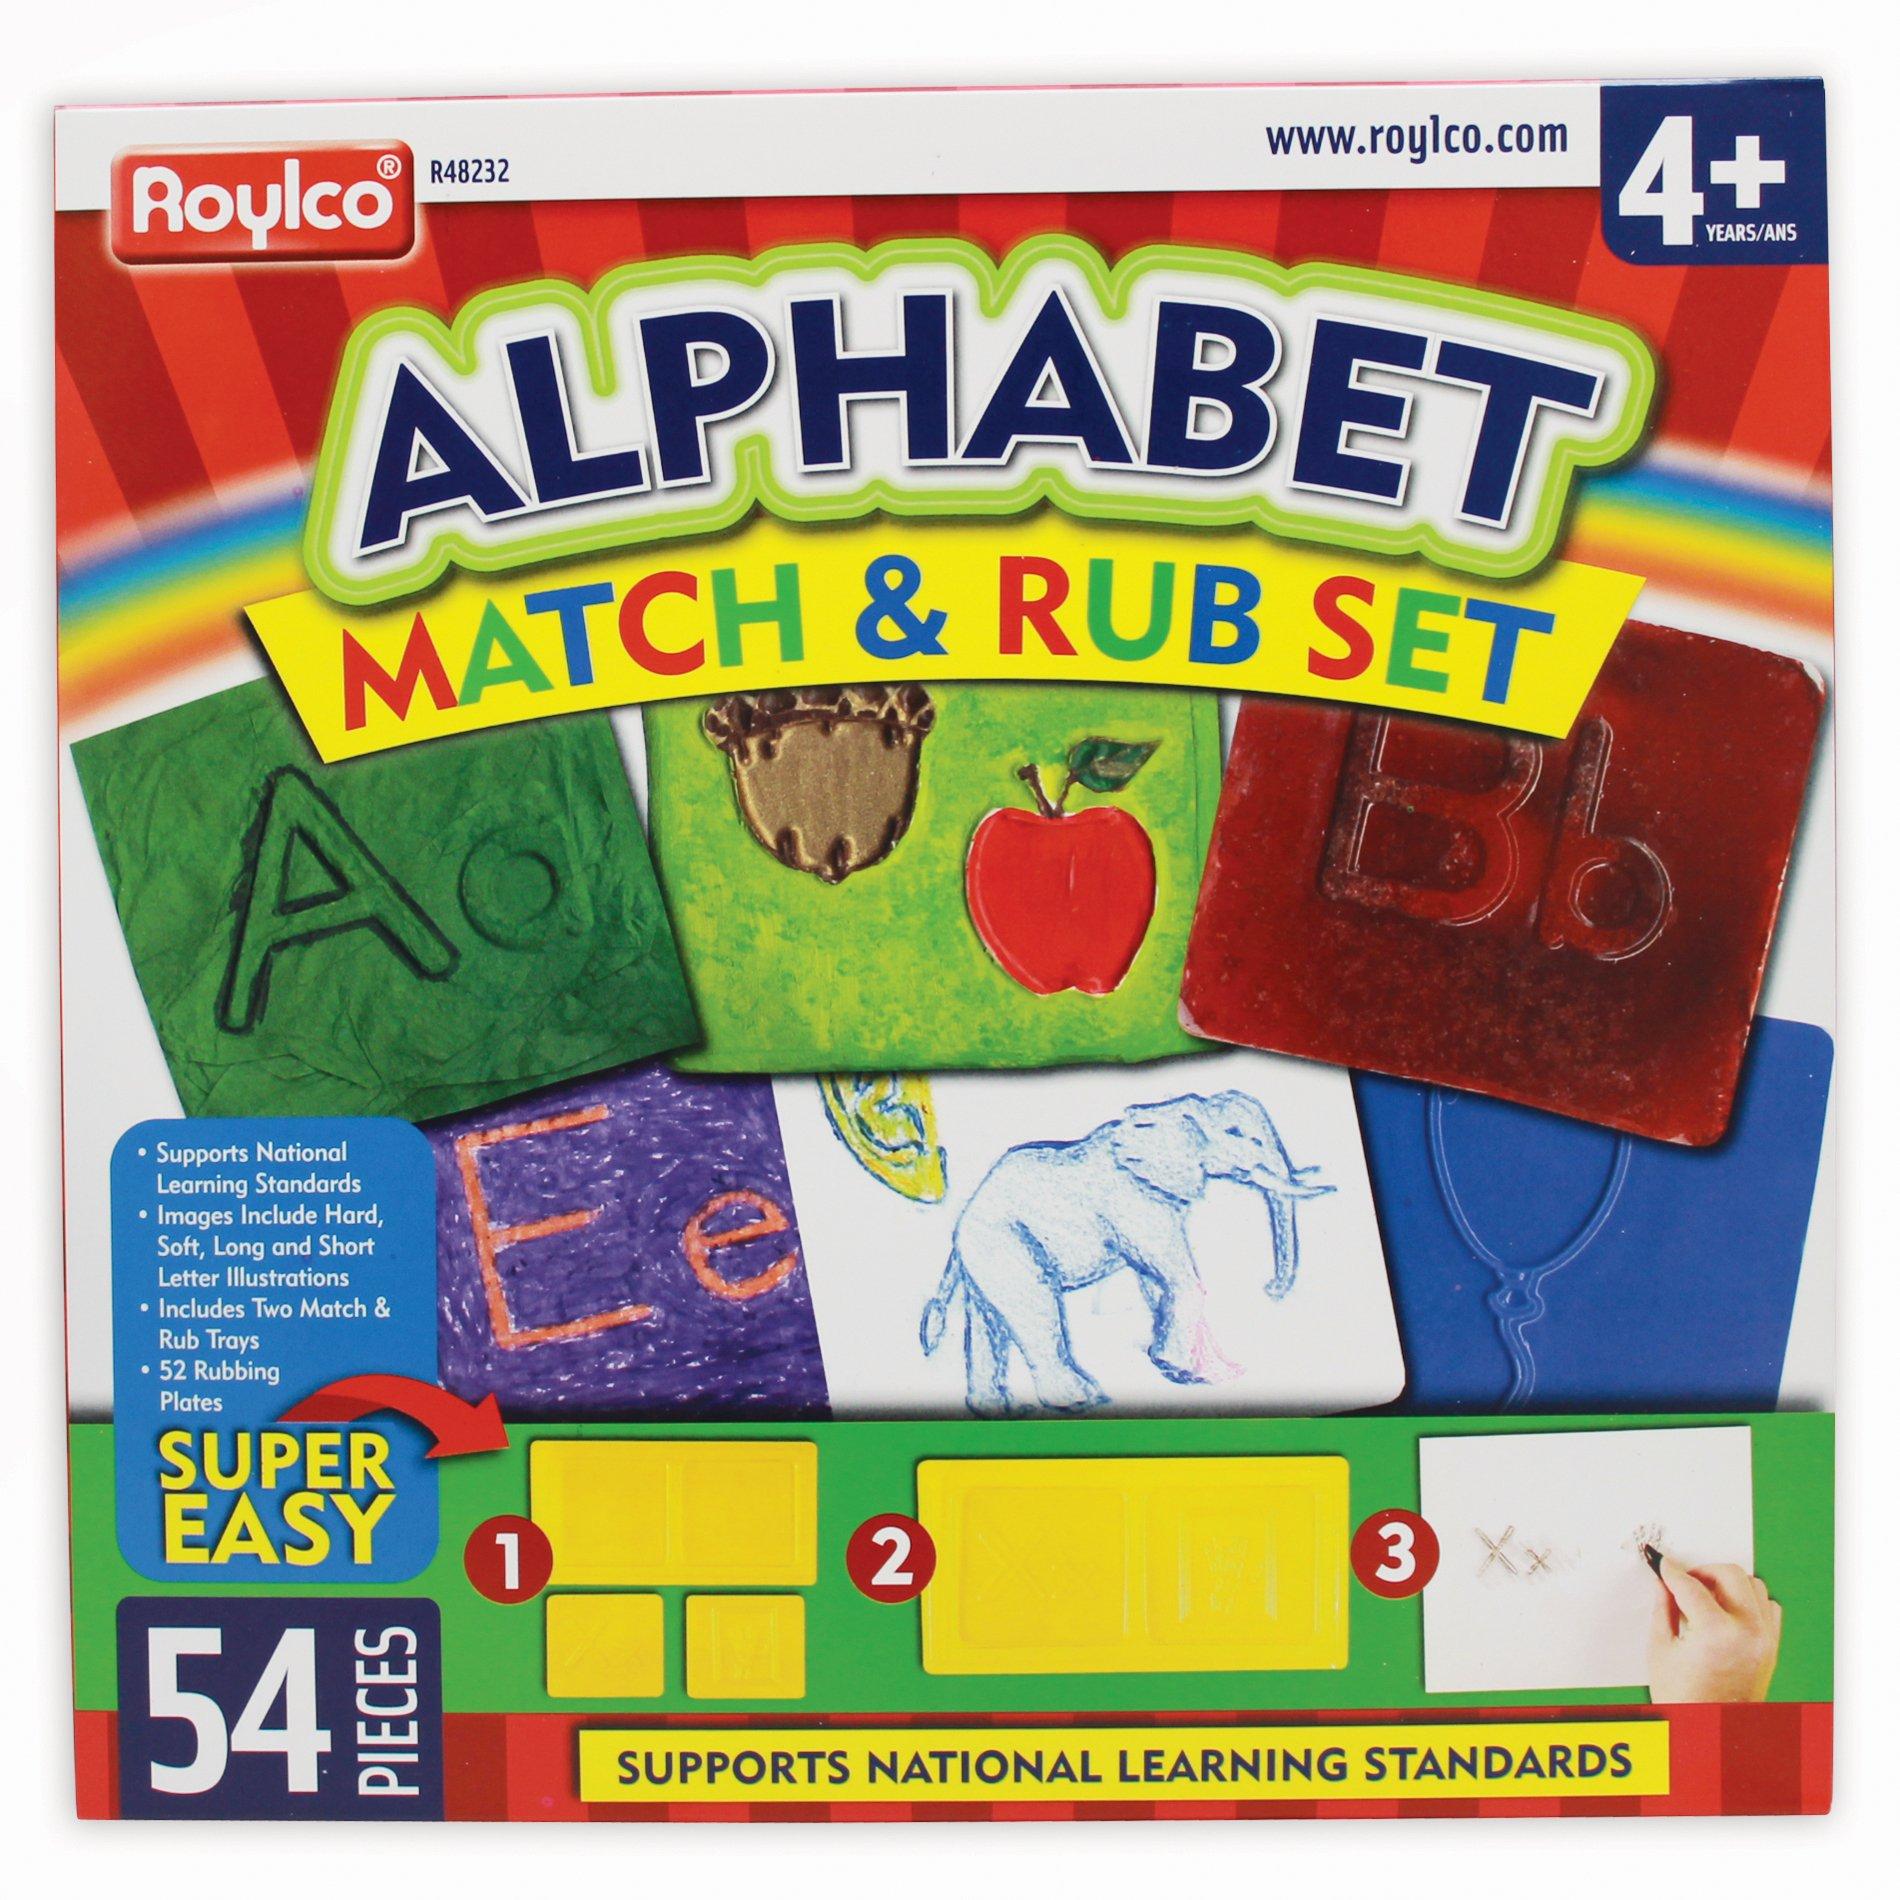 Roylco Alphabet Match & Rub Set Rubbing Plates by Roylco